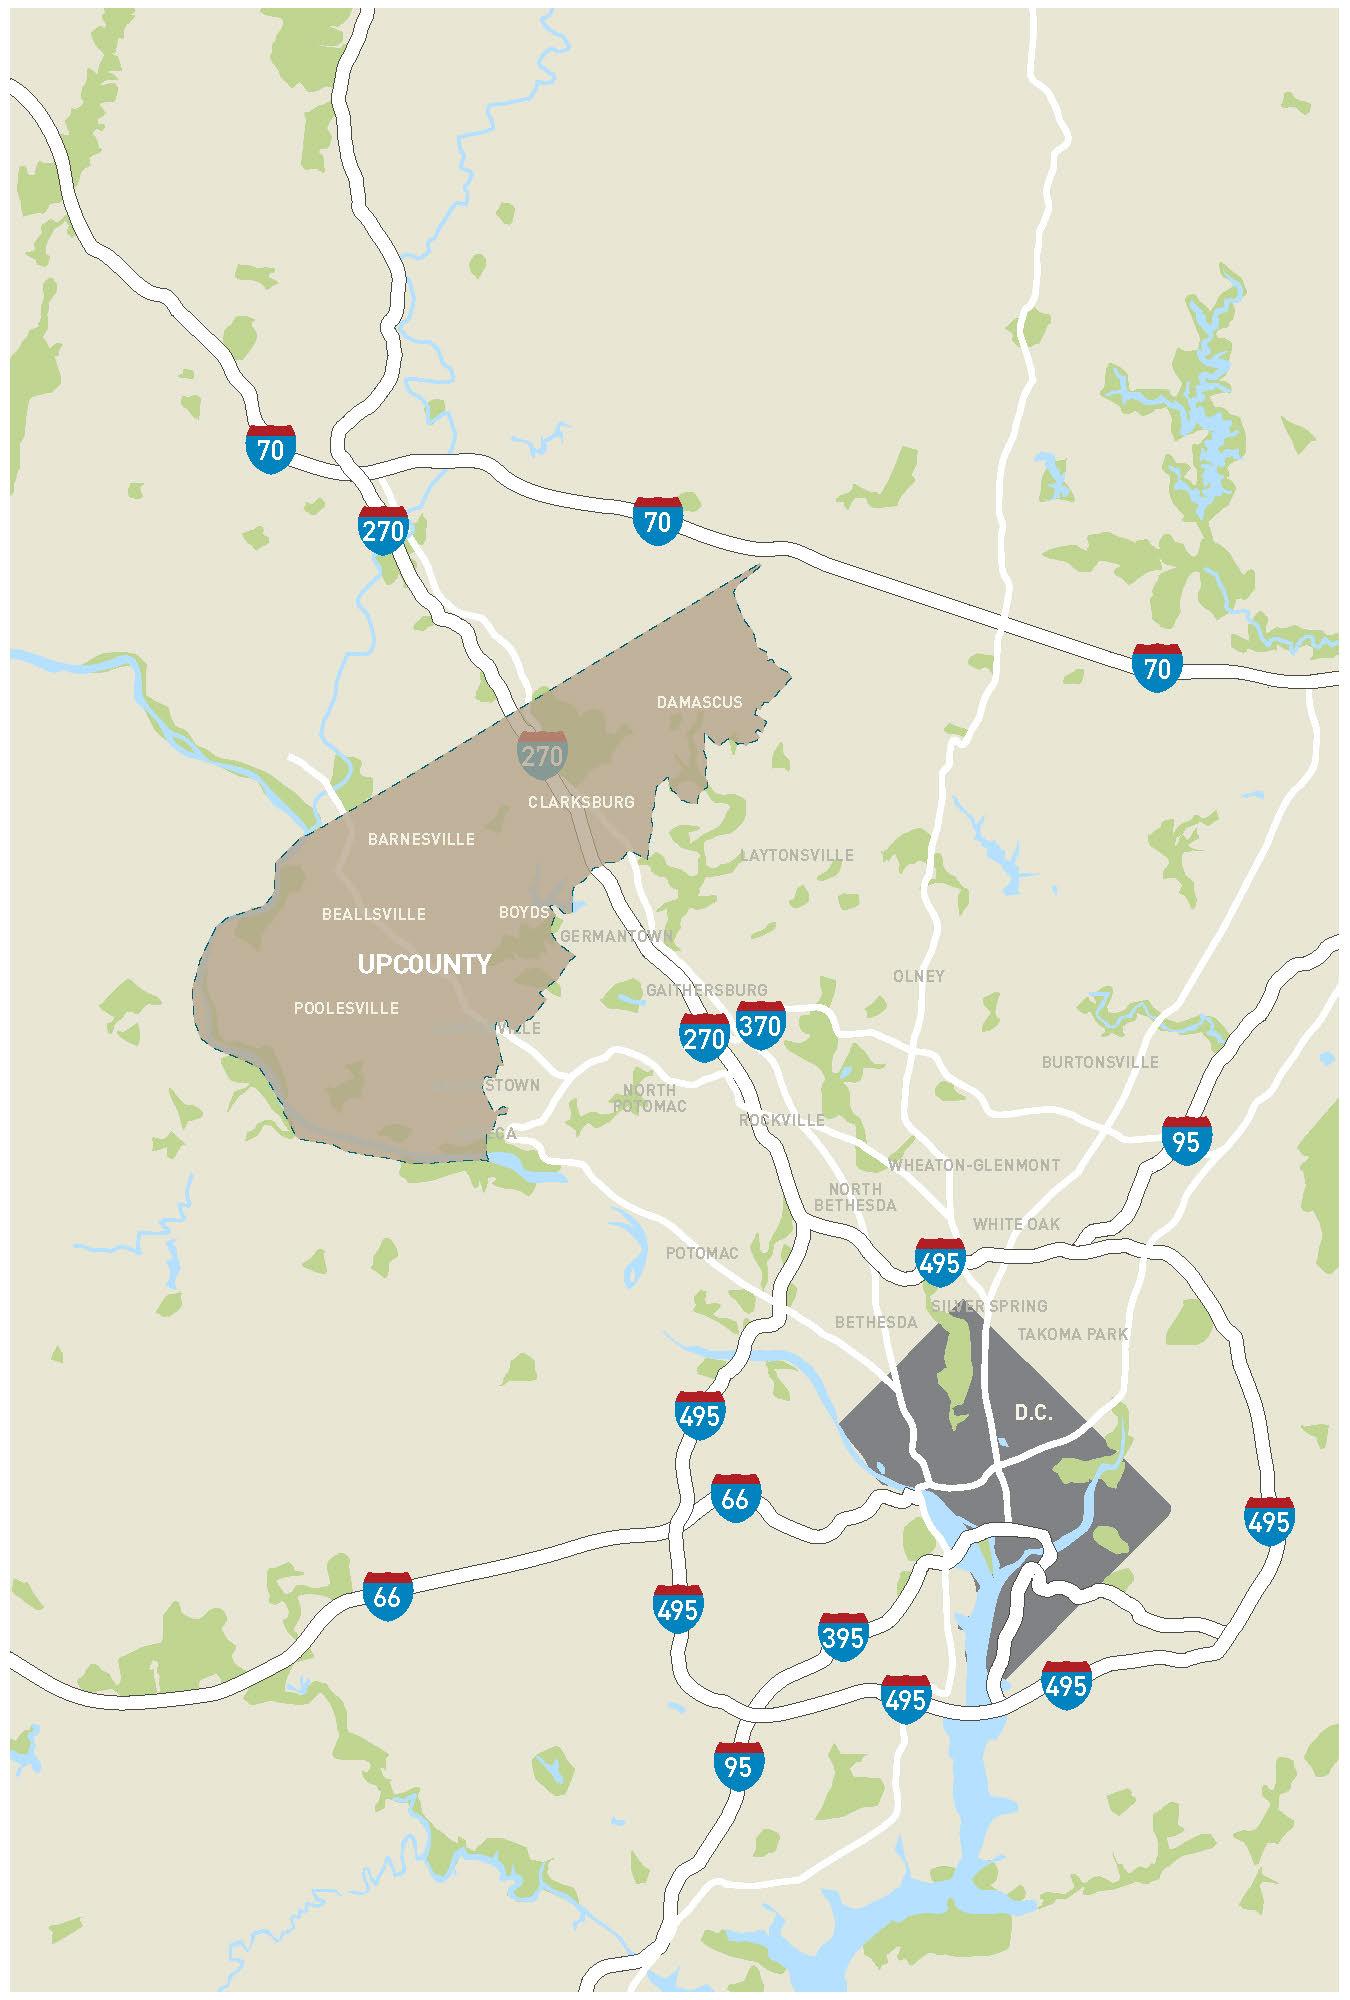 UpCounty_map.jpg